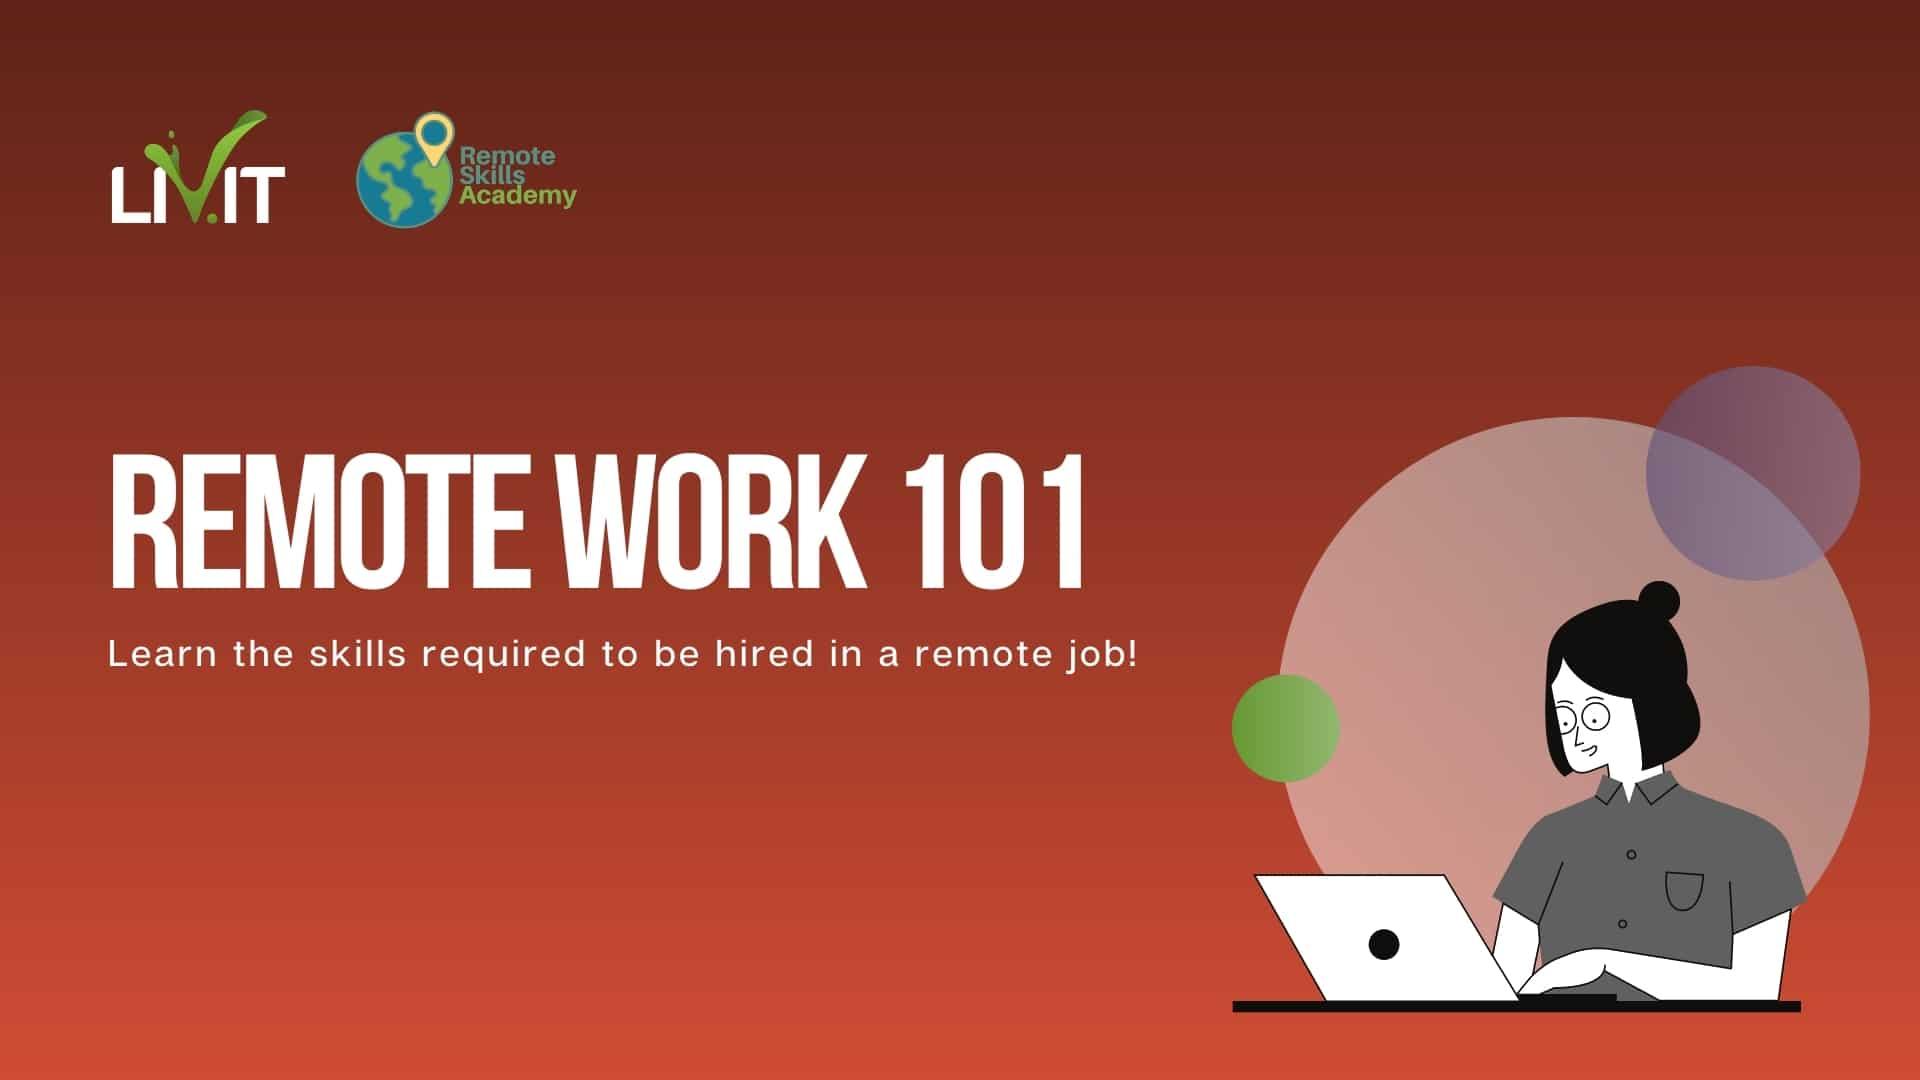 remotework101 banner